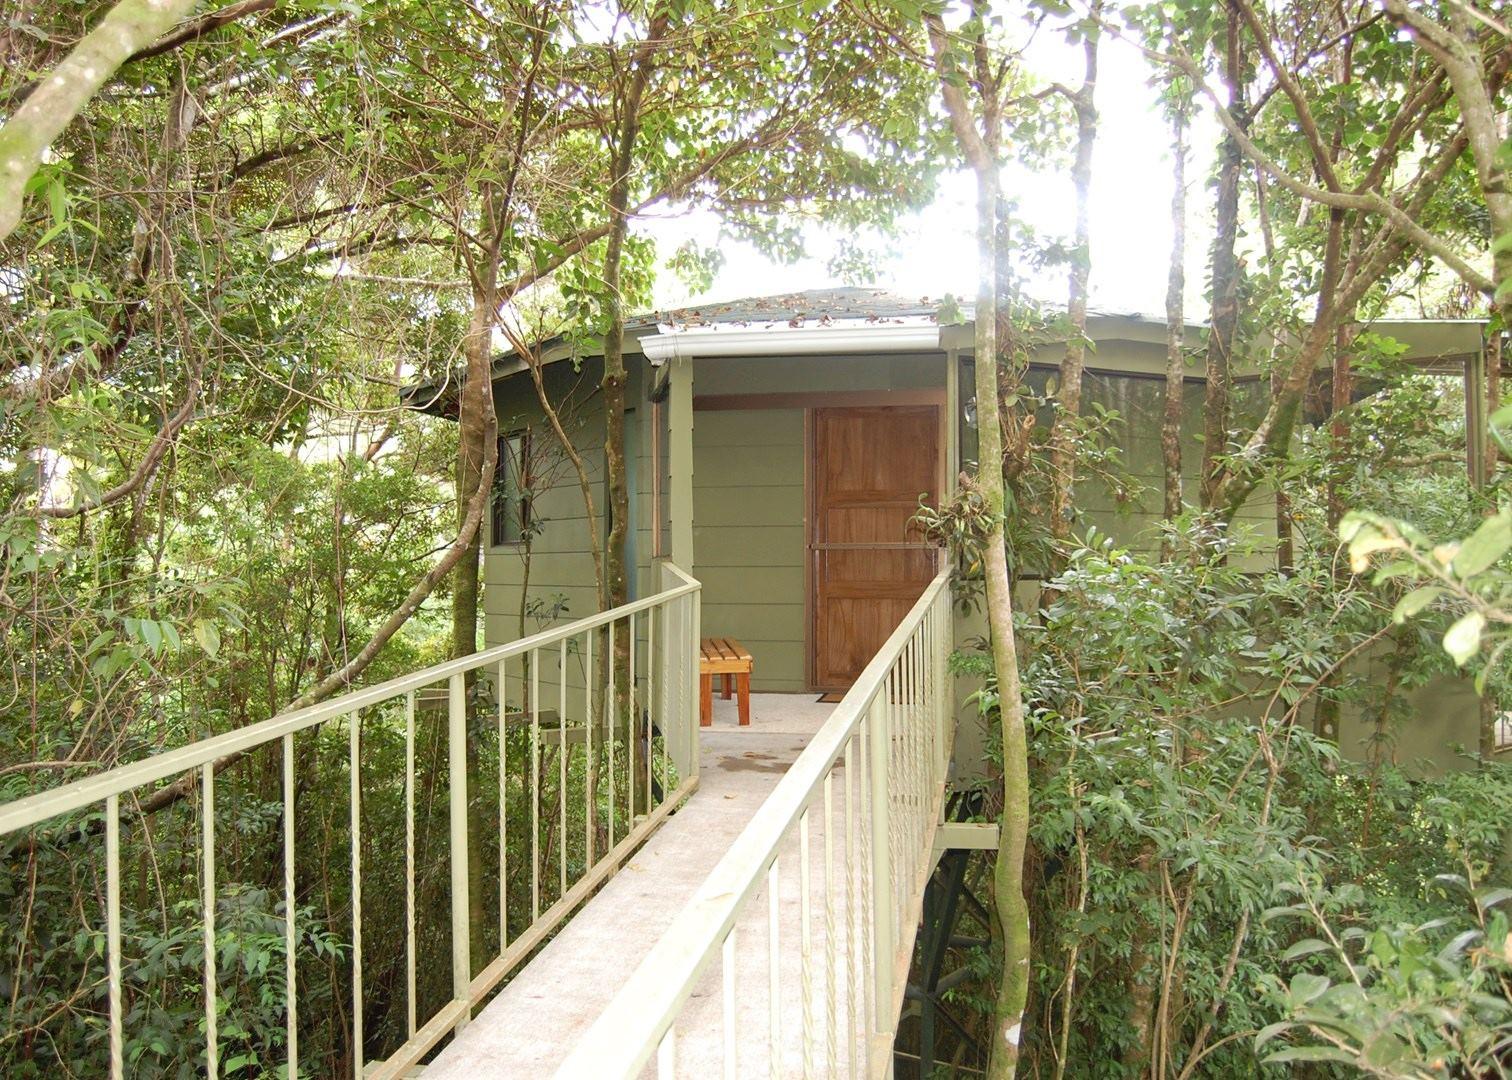 Hidden Canopy Treehouse Monteverde Cloudforest & Hidden Canopy Treehouse | Audley Travel